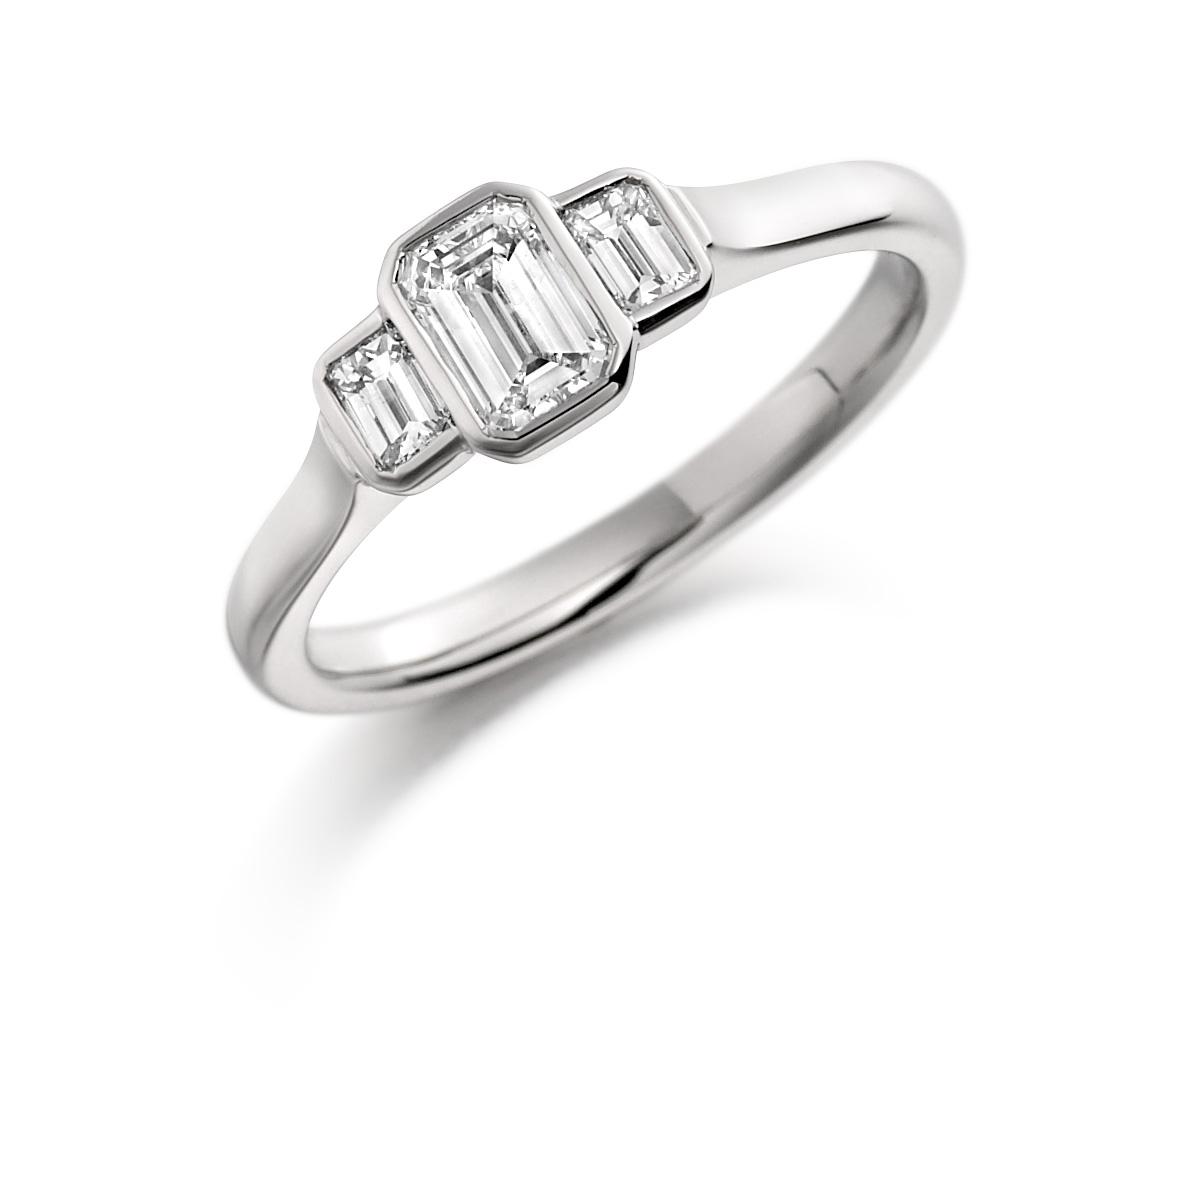 Giuditta emerald cut diamond engagement ring Hatton Garden